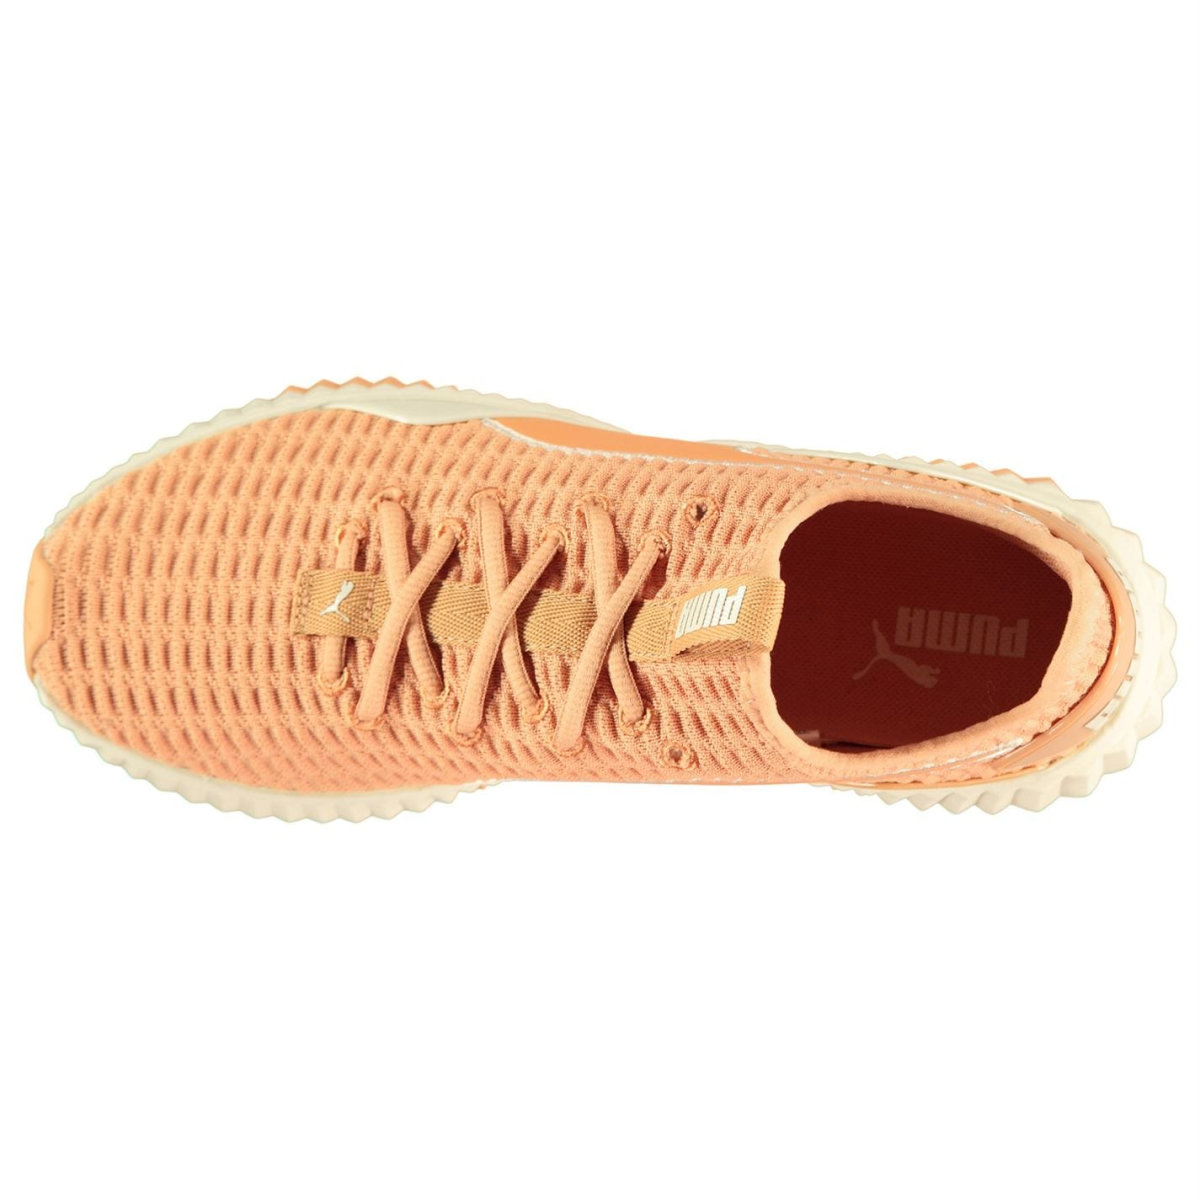 Puma-Defy-Turnschuhe-Damen-Sneaker-Sportschuhe-Laufschuhe-9005 Indexbild 13